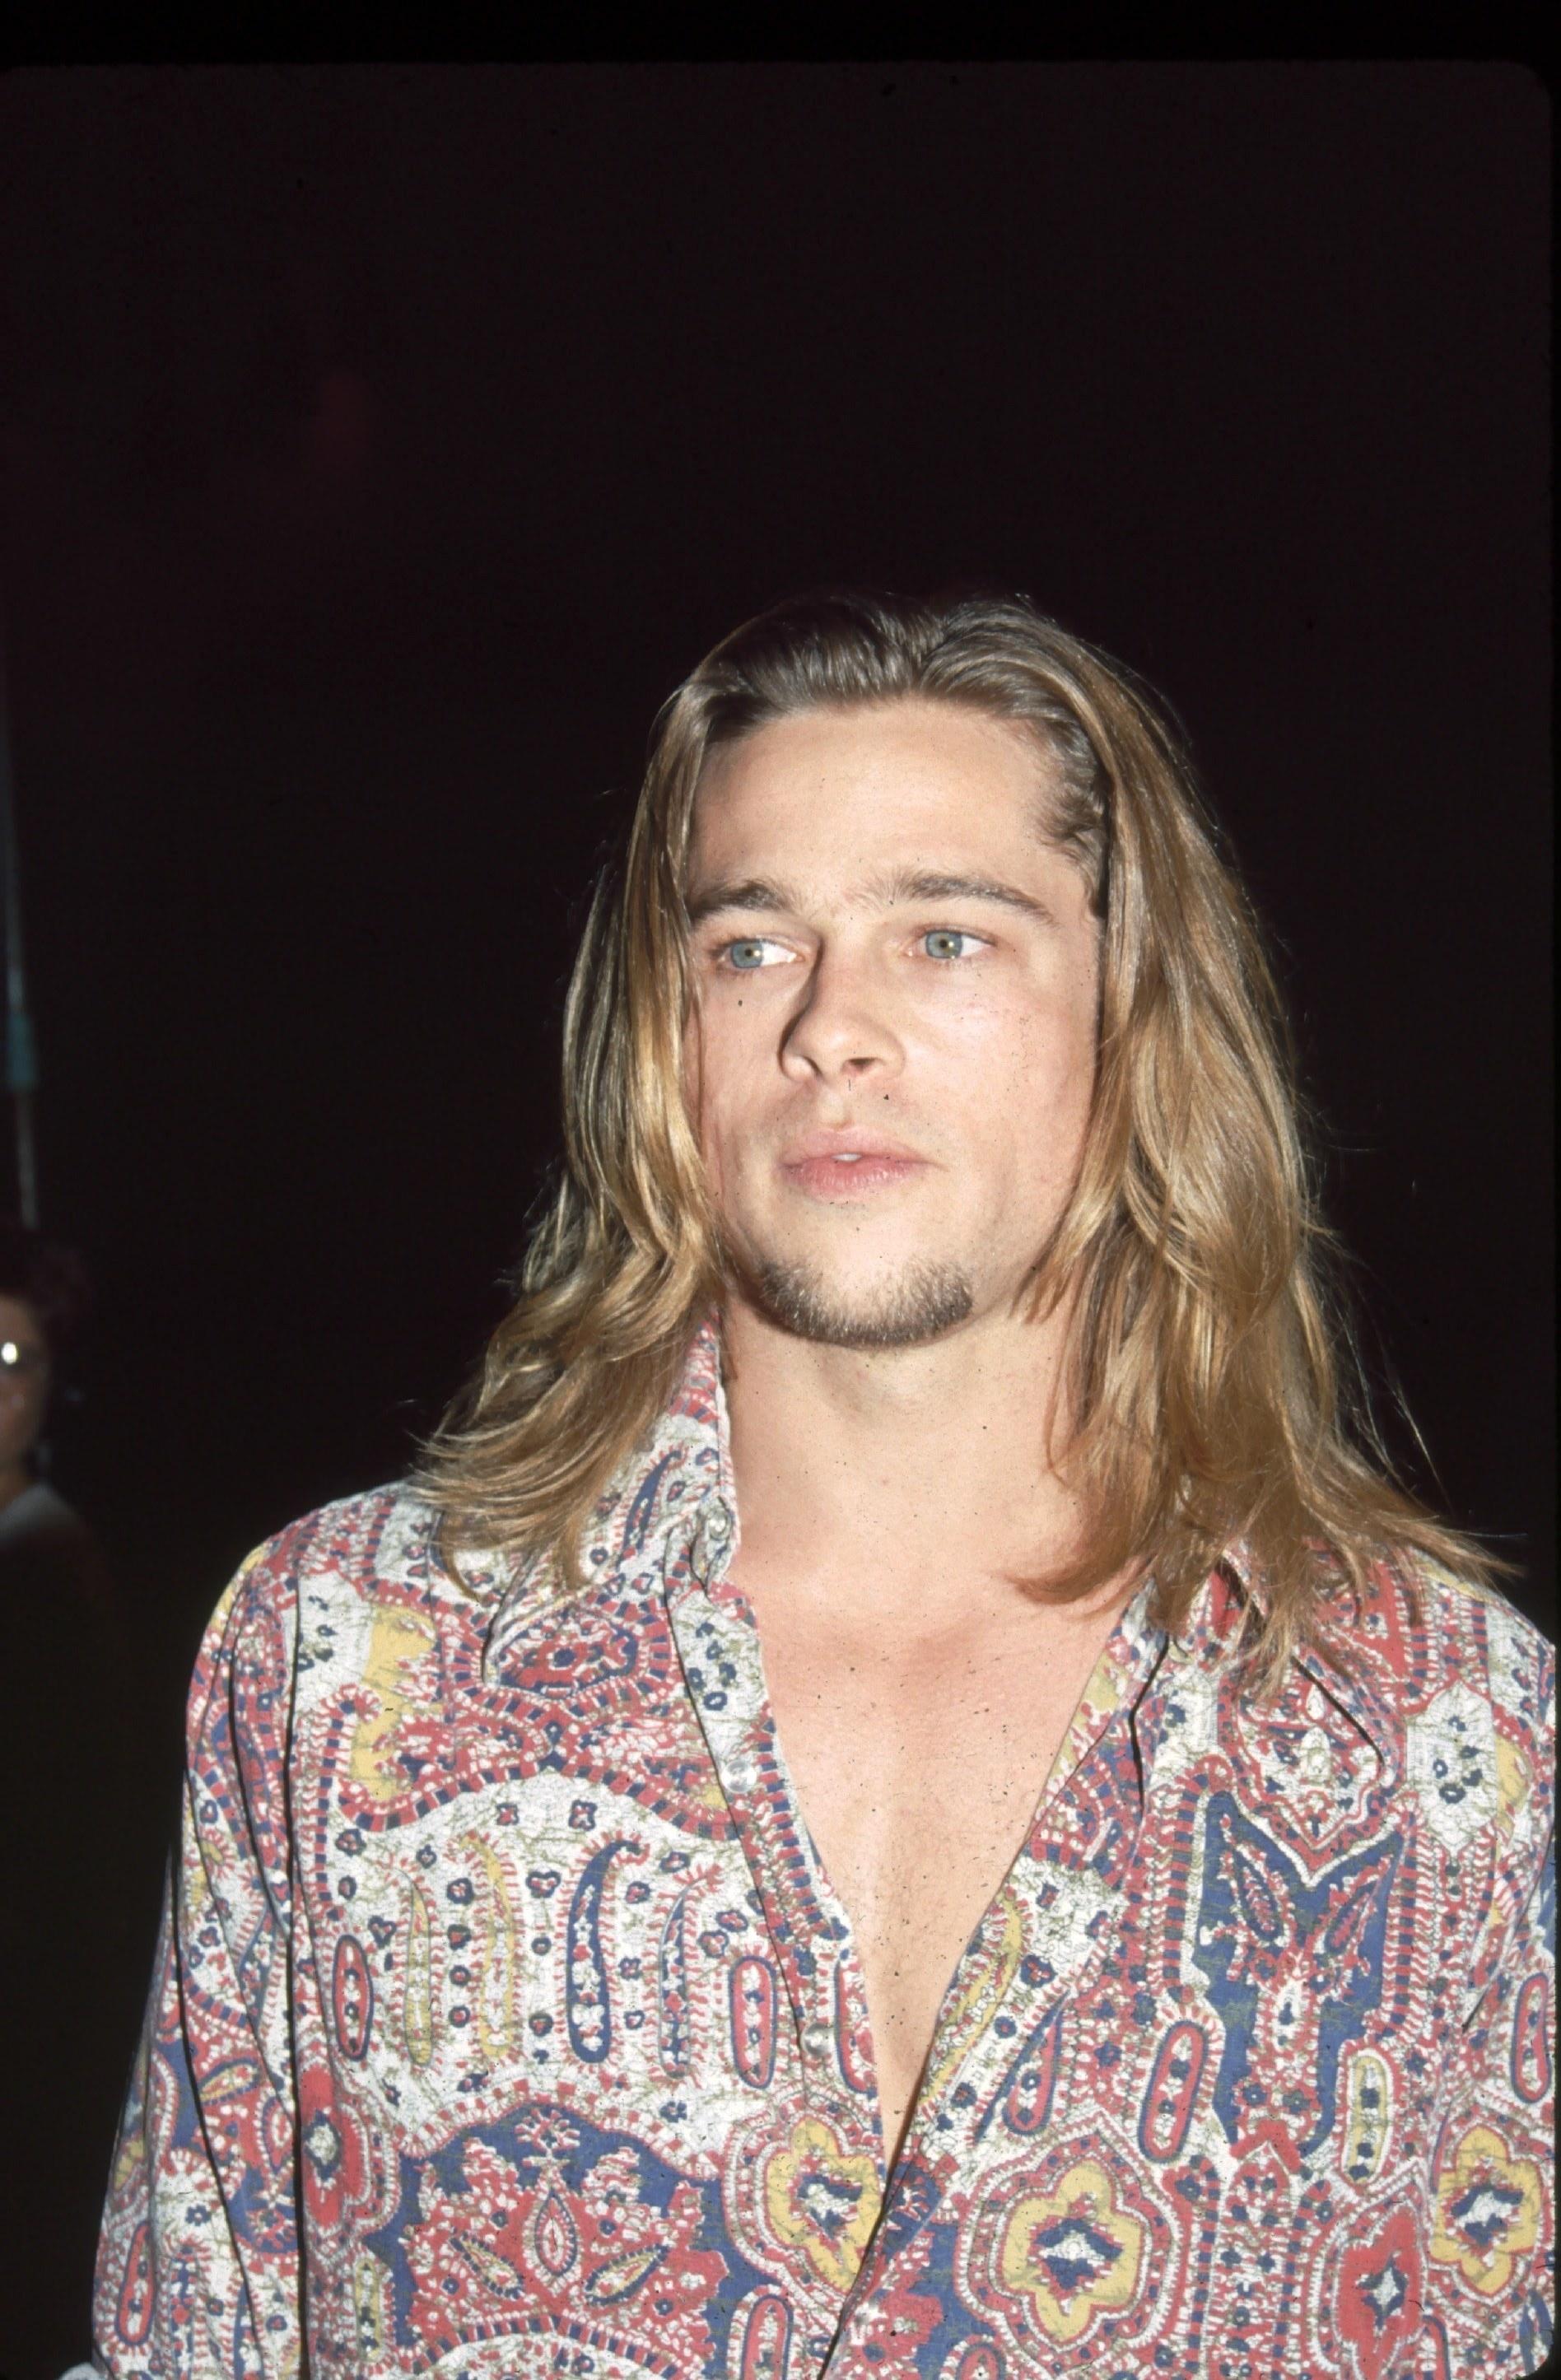 With long hair and paisley shirt